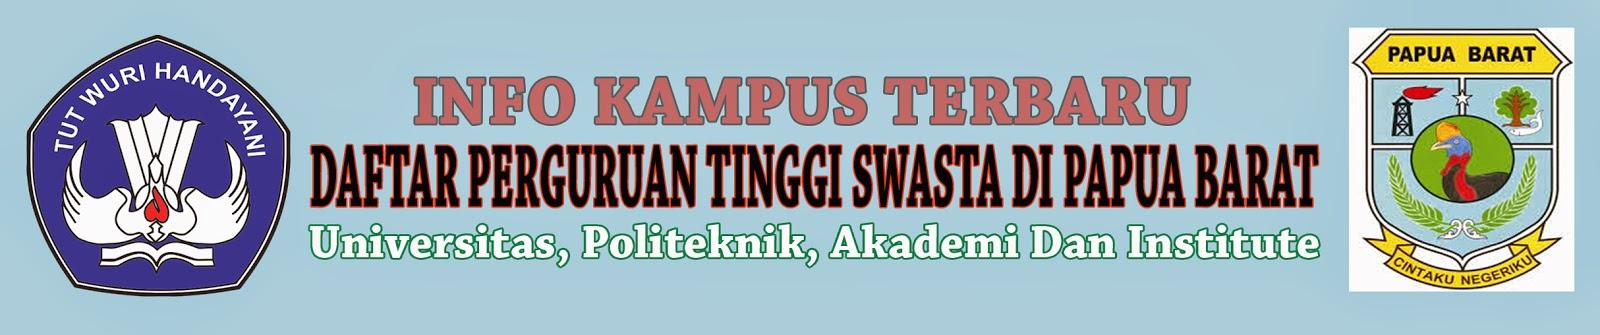 Daftar Perguruan Tinggi Swasta Di Papua Barat